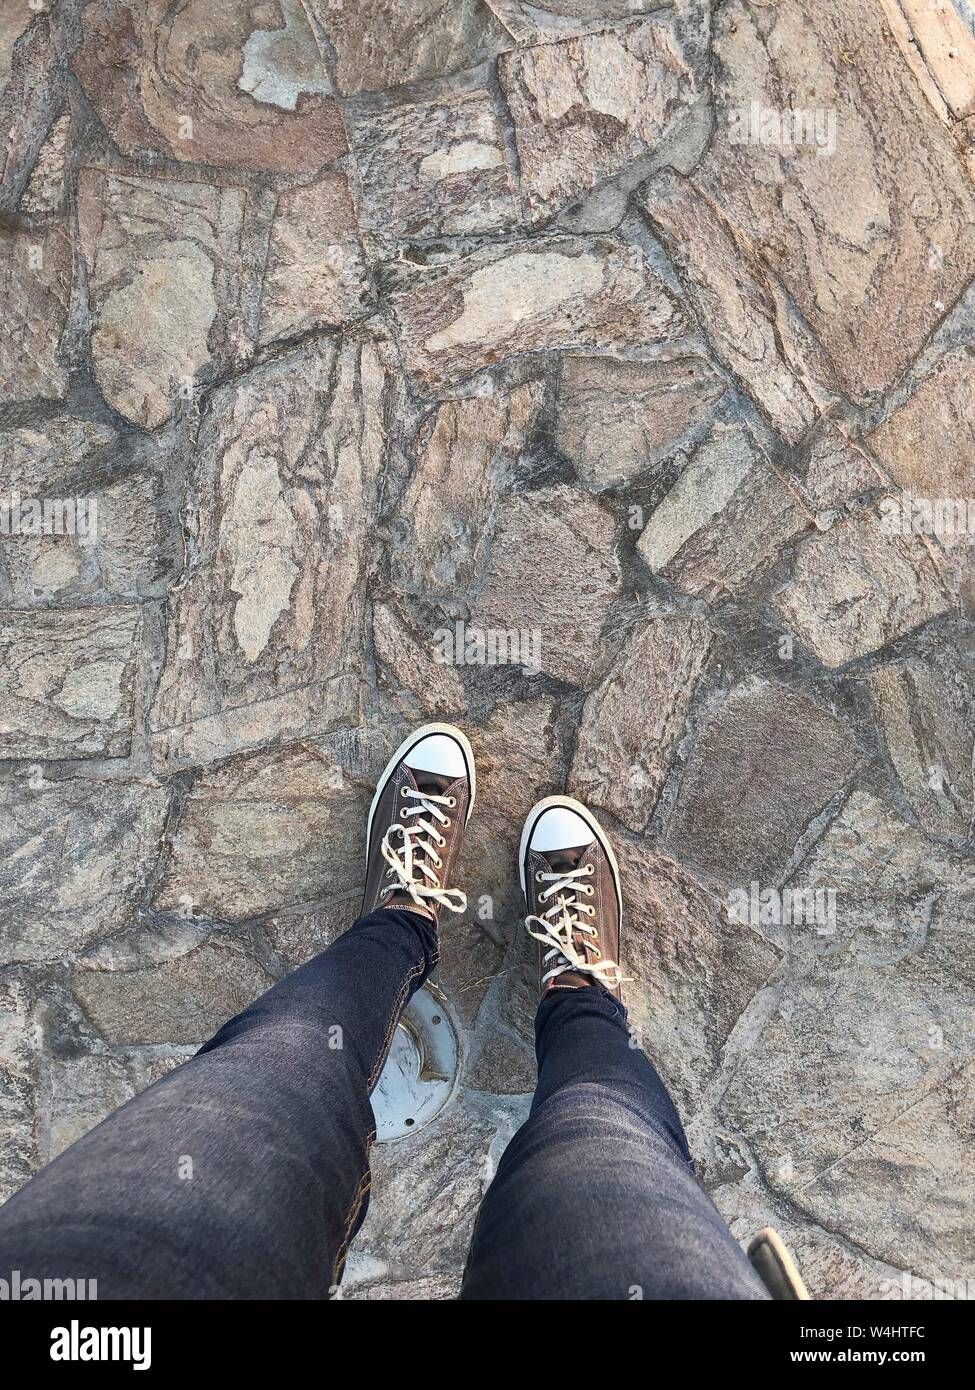 Bilder Stockfotosamp; Alamy Skinny Jeans 76Yfbgy